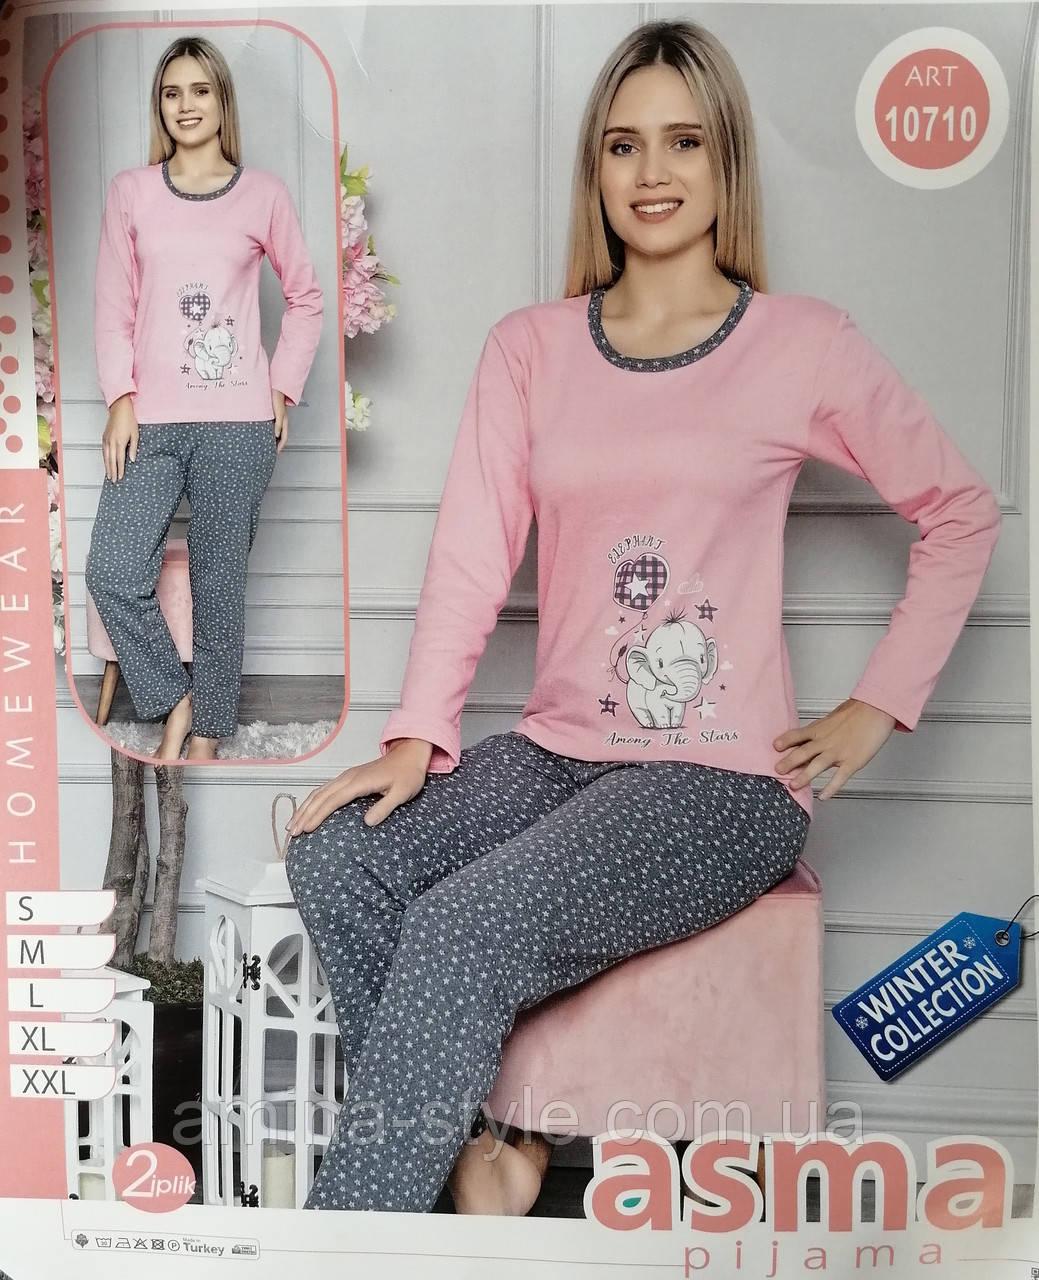 Утепленная женская  пижама, начес. Одежда для дома и сна. Размер S(42-44). Турция